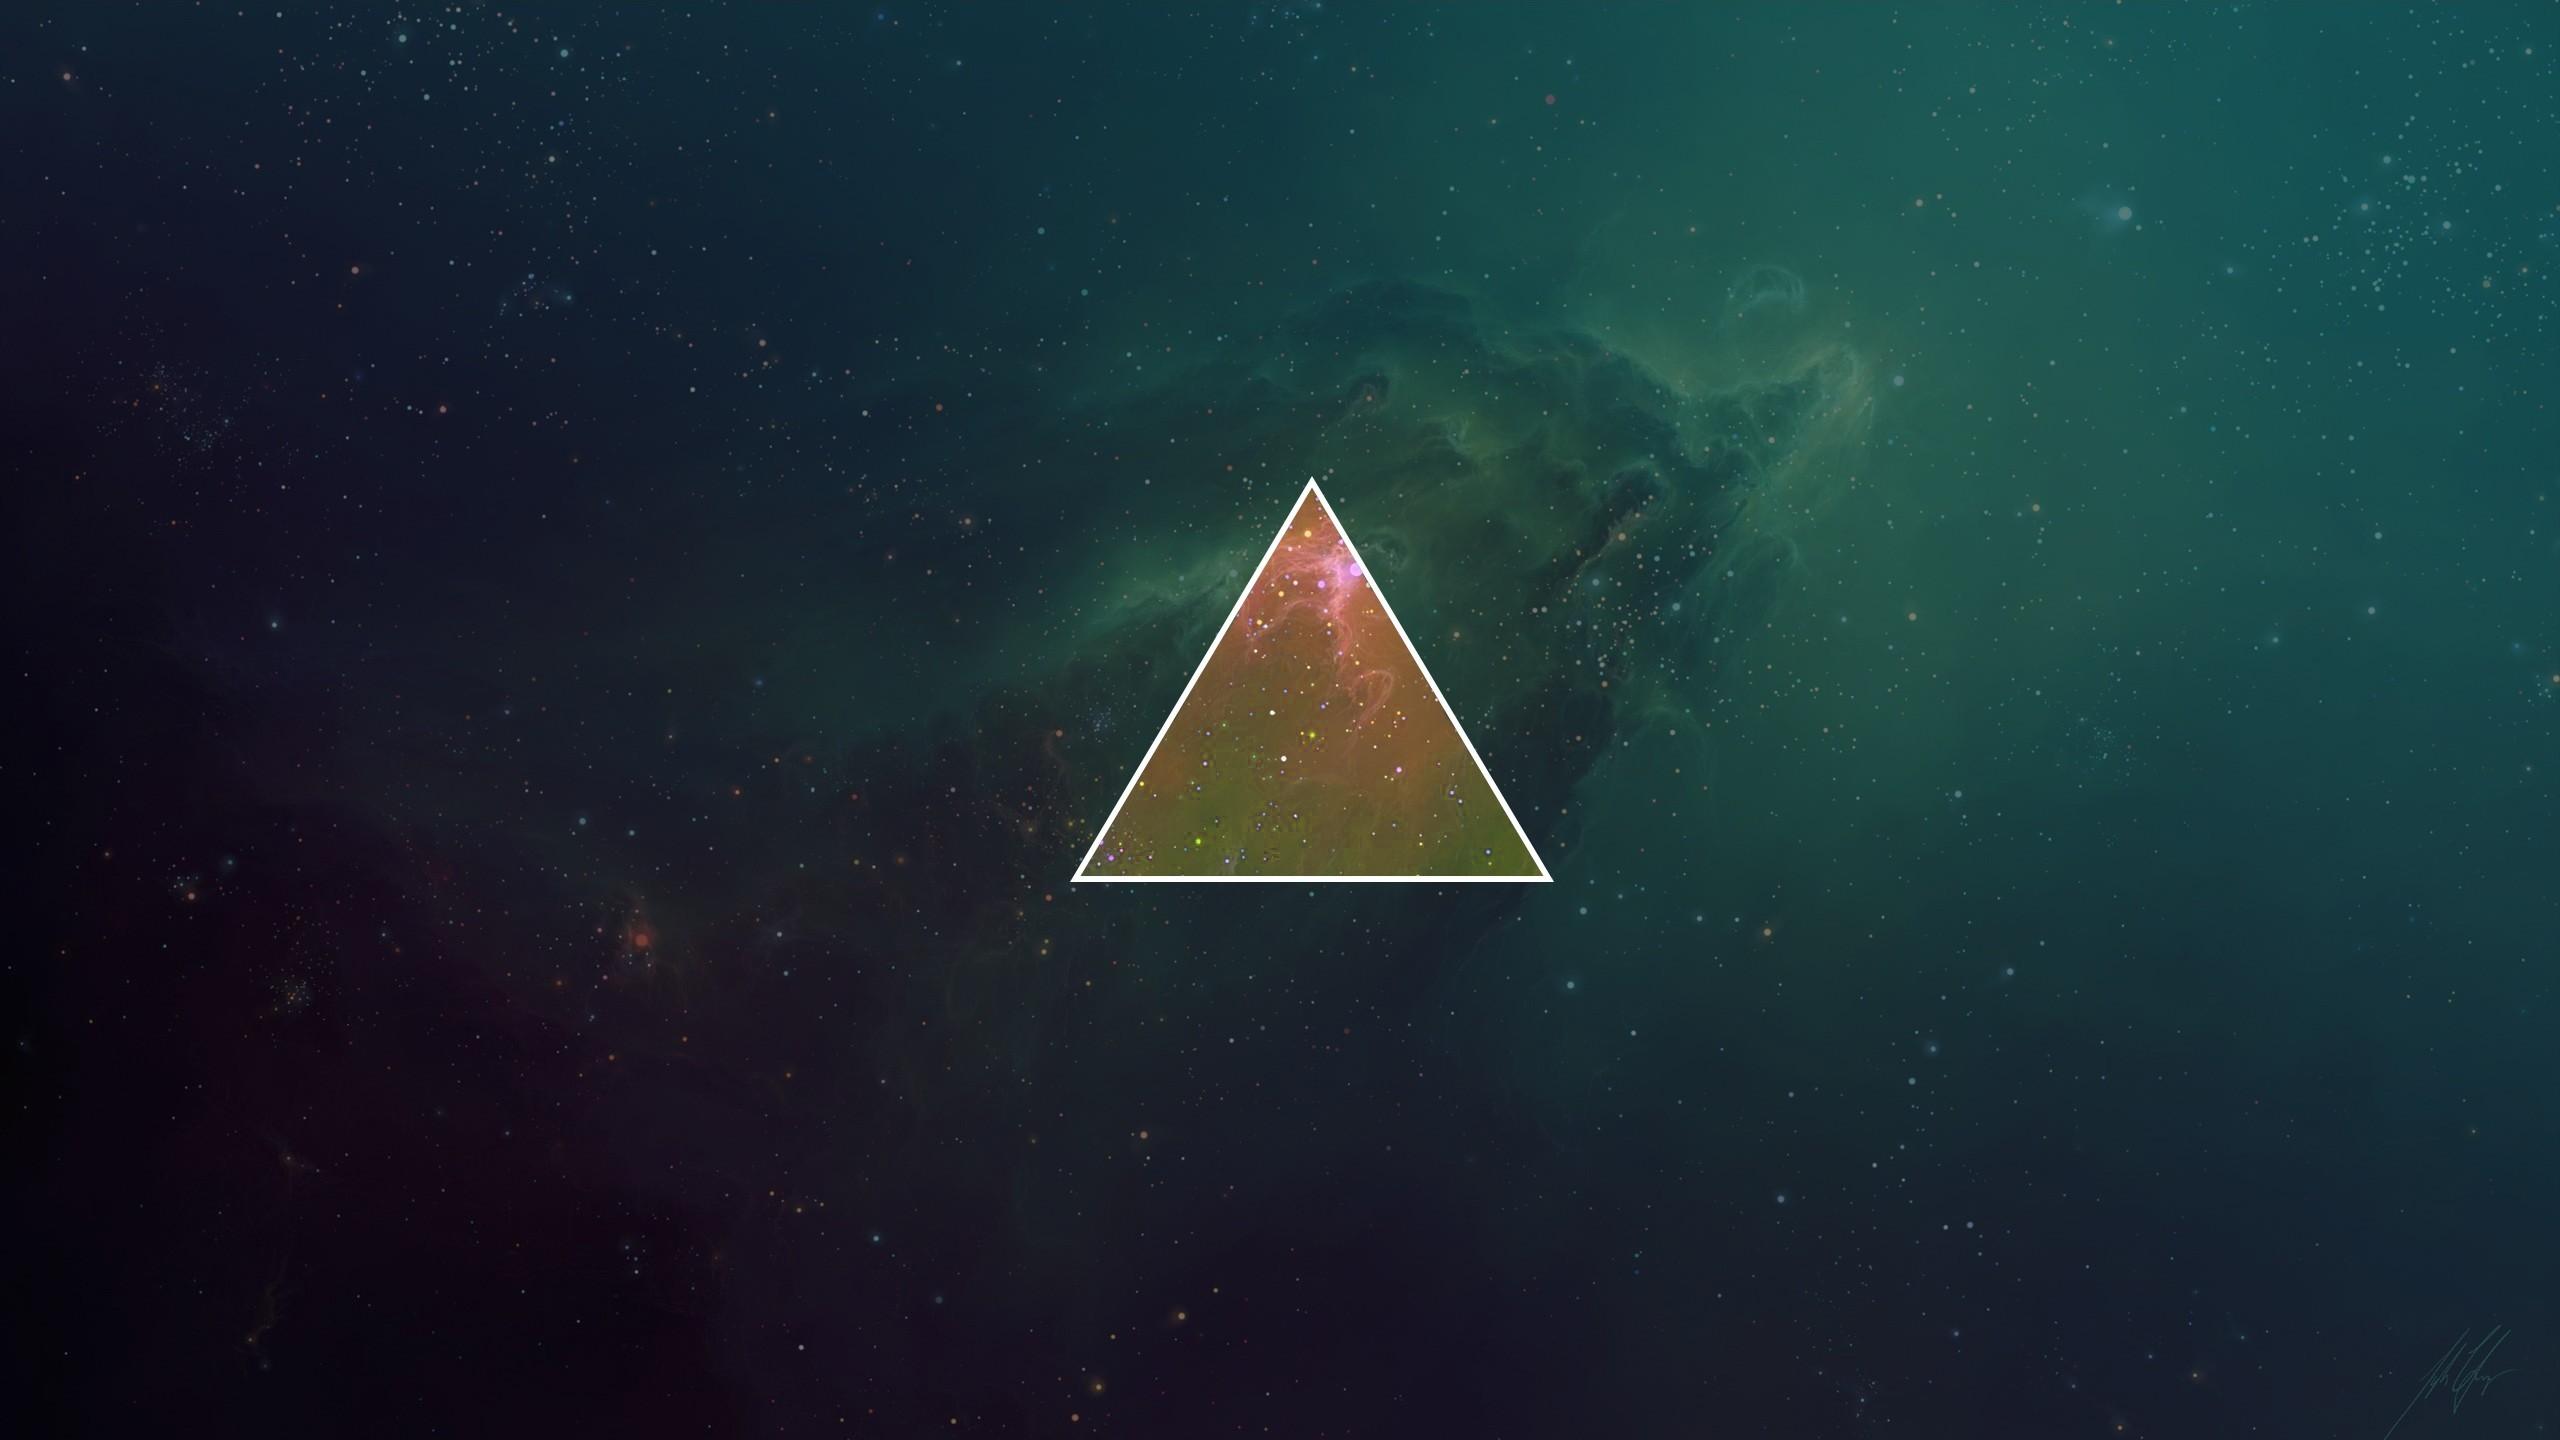 illuminati Wallpapers High Resolution. illuminati Wallpapers High  Resolution For Desktop.